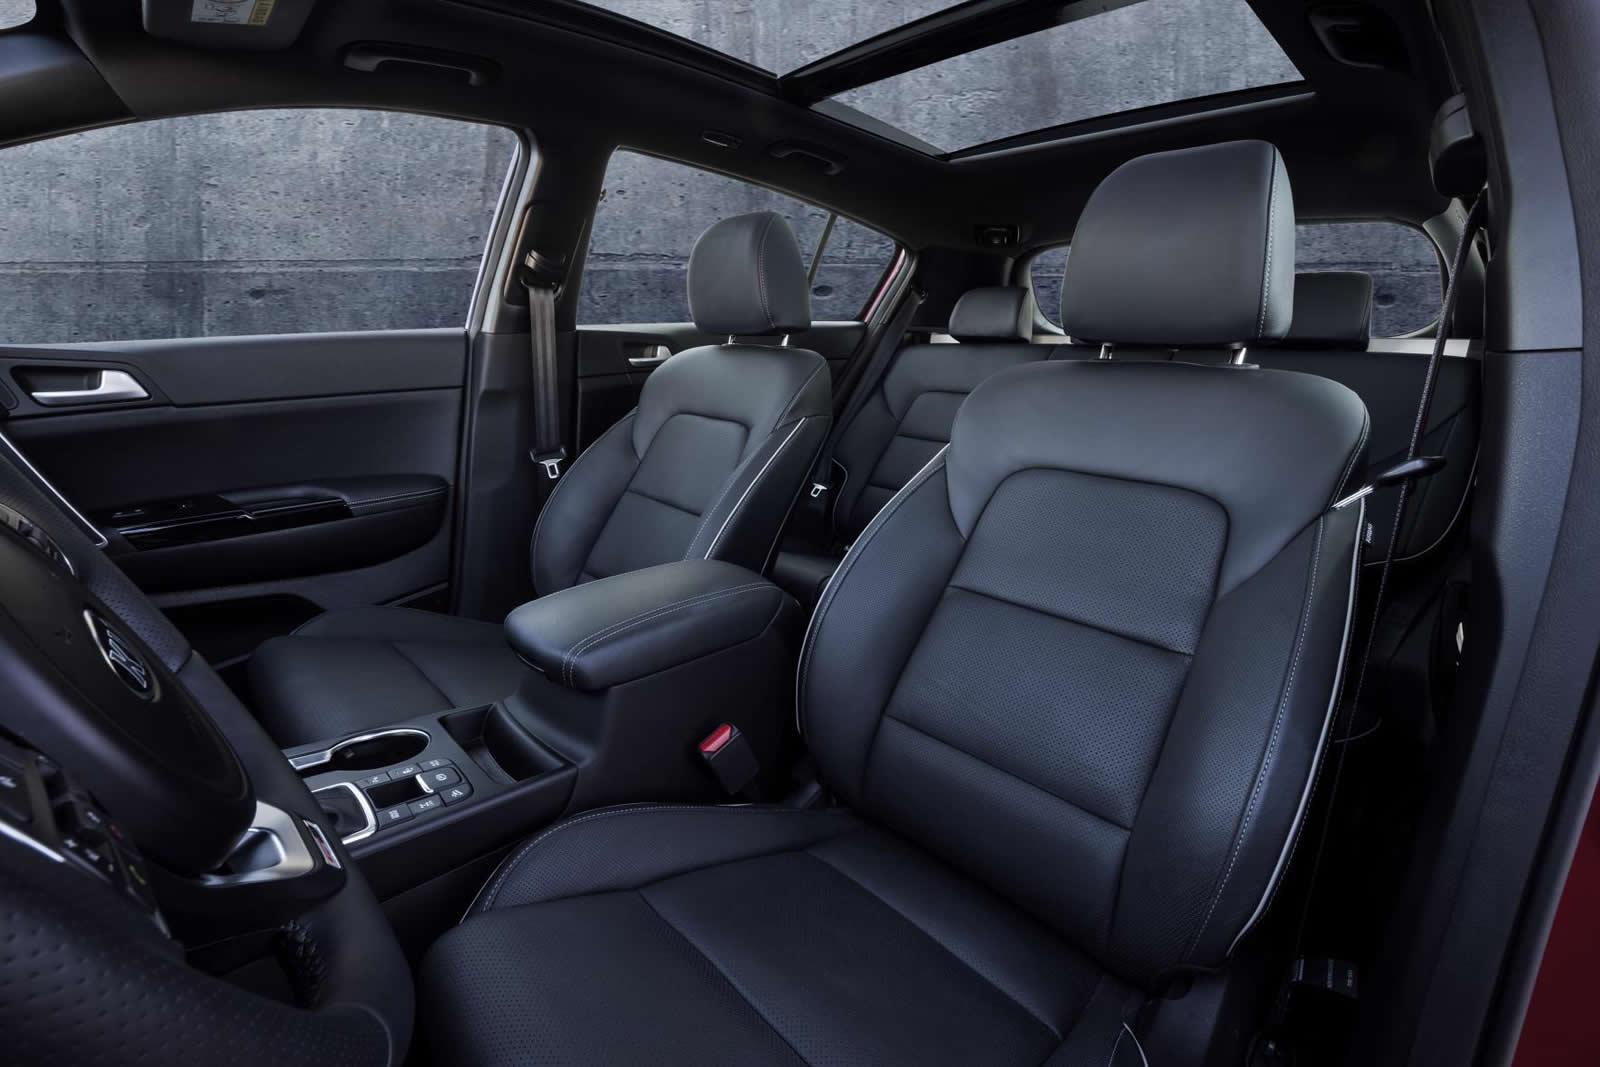 2016 Kia Sportage seats press shots